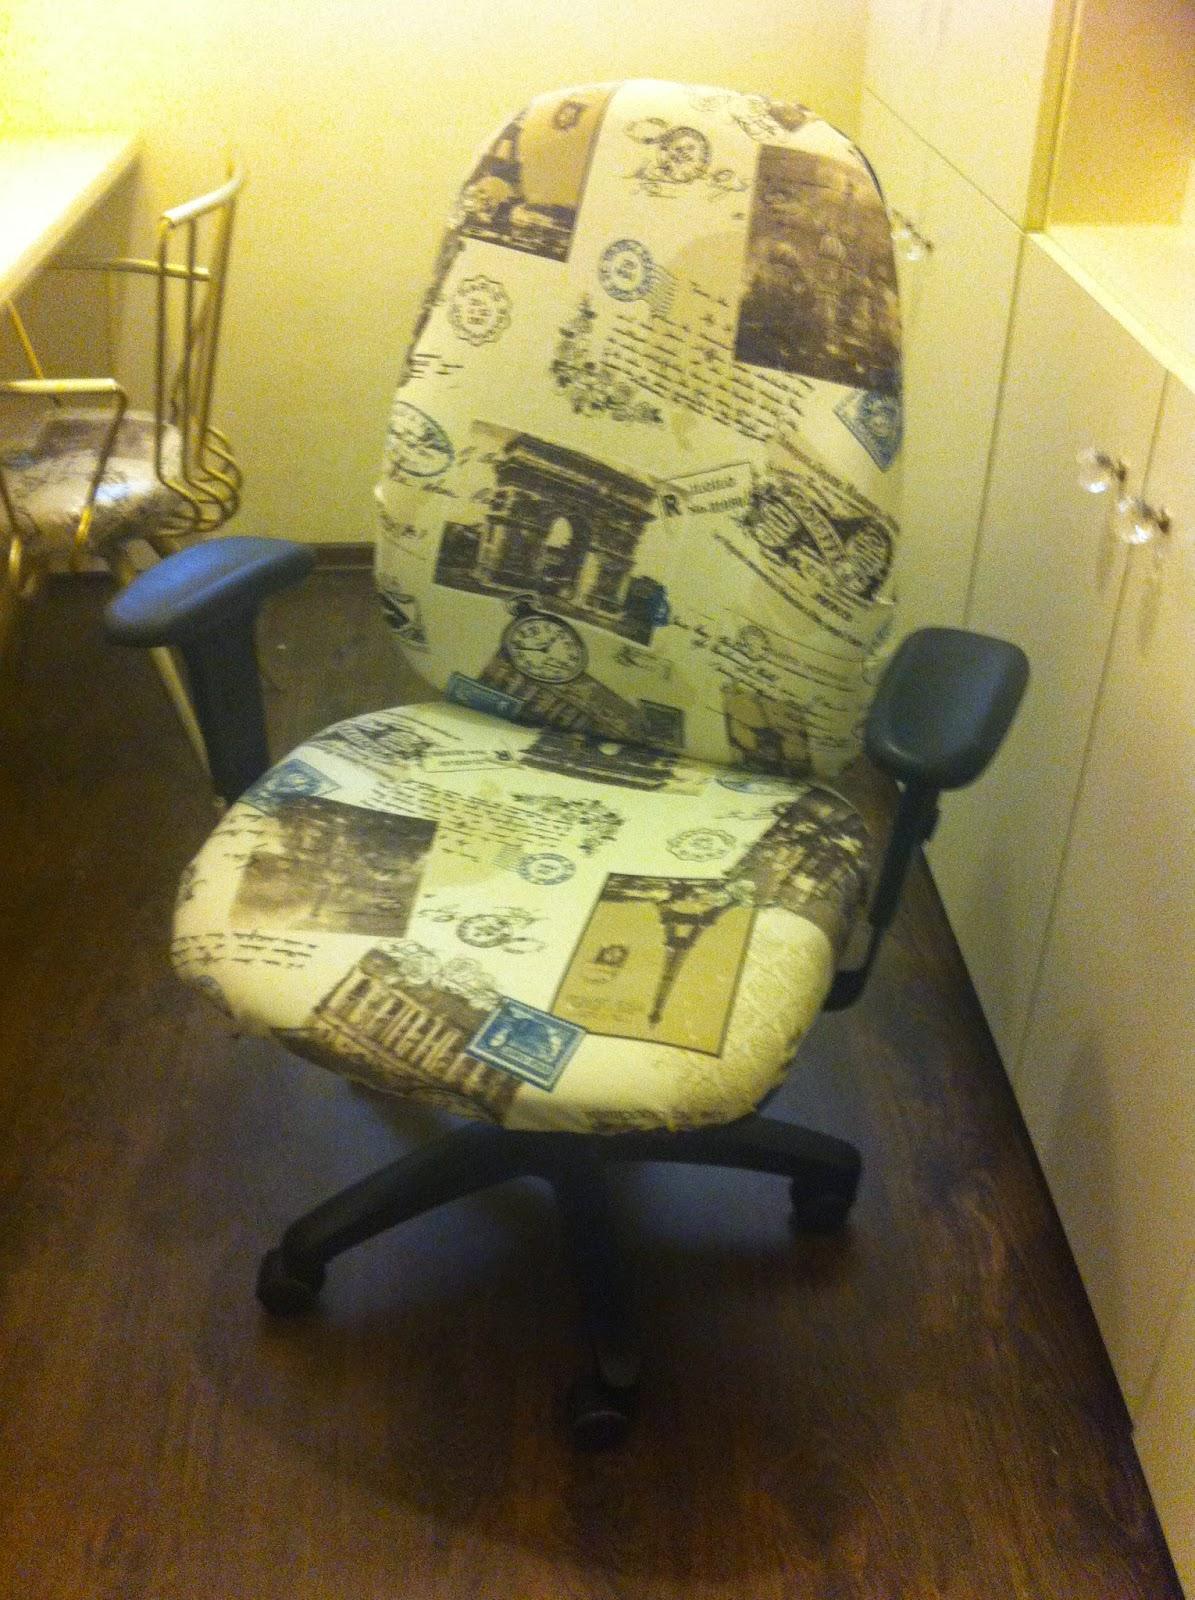 IMG 7076%5B1%5D - ריפוד כסא משרדי